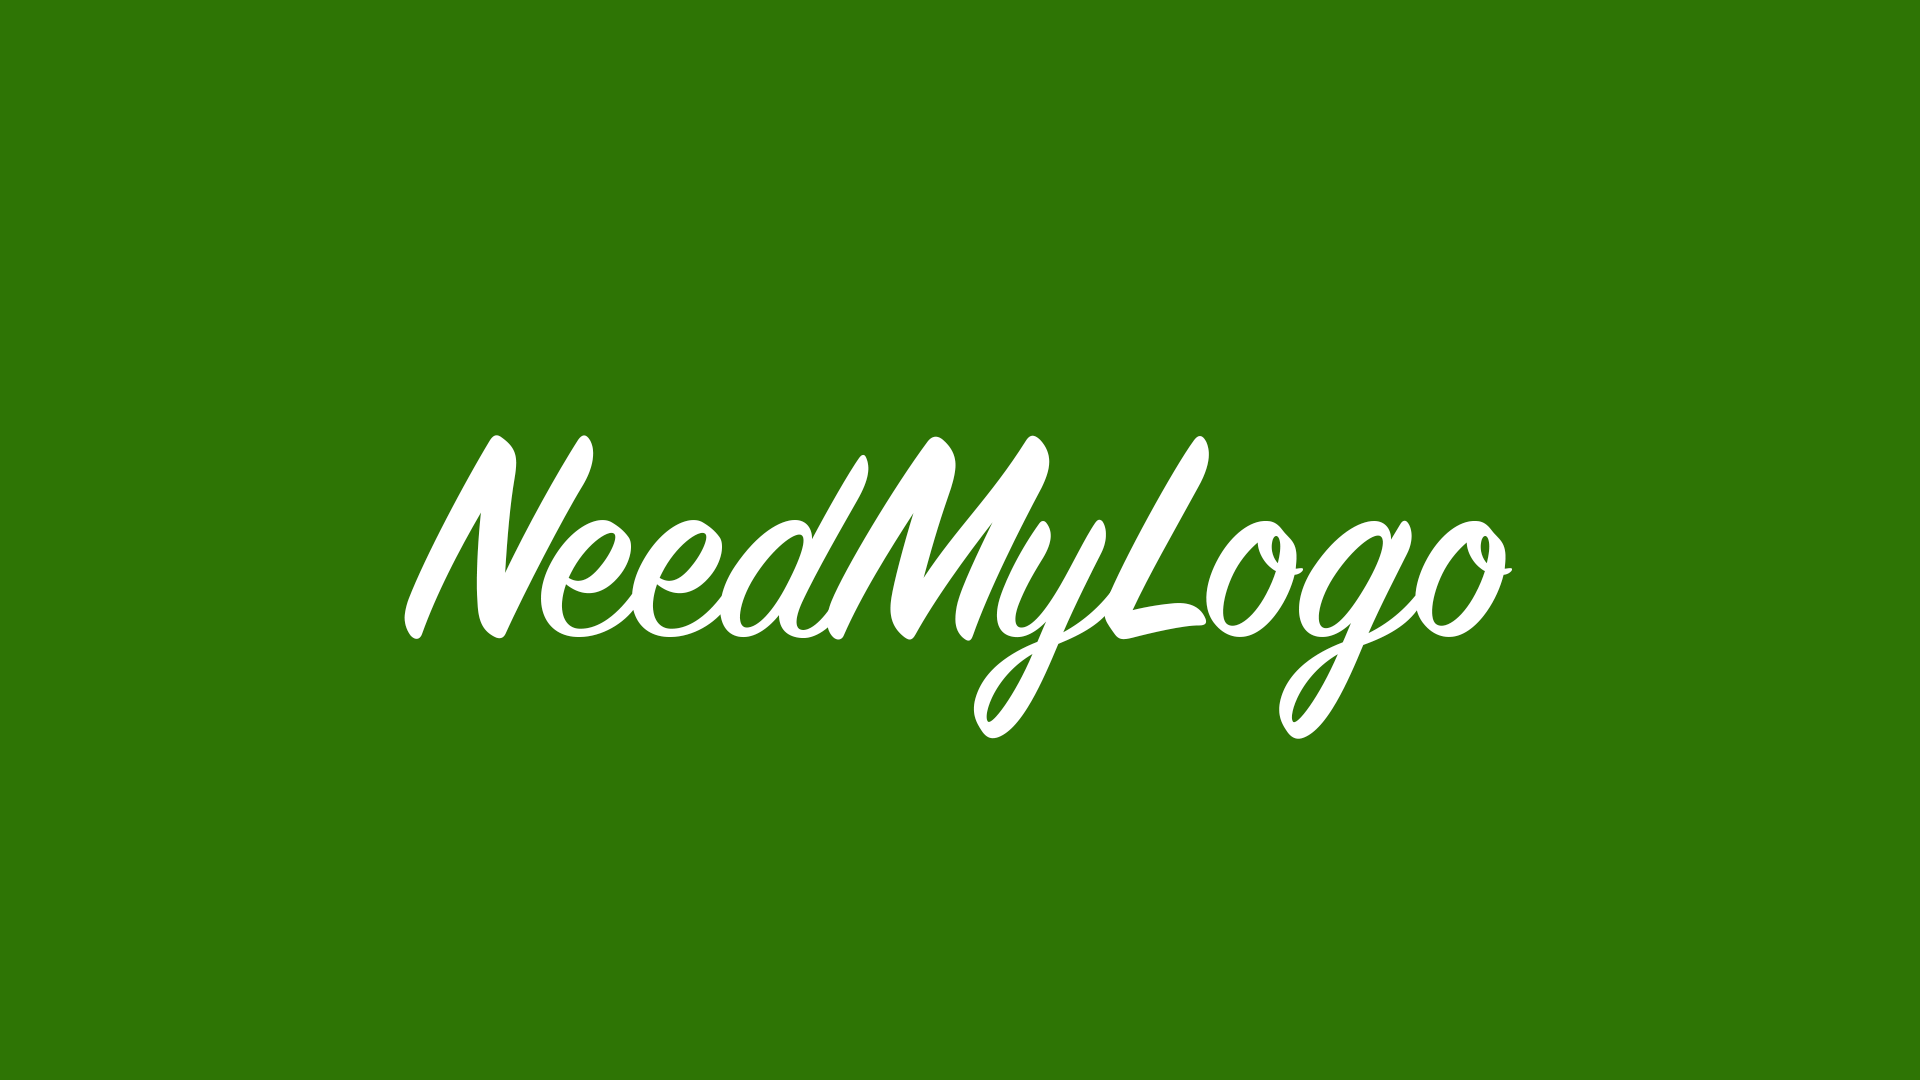 NeedMyLogo